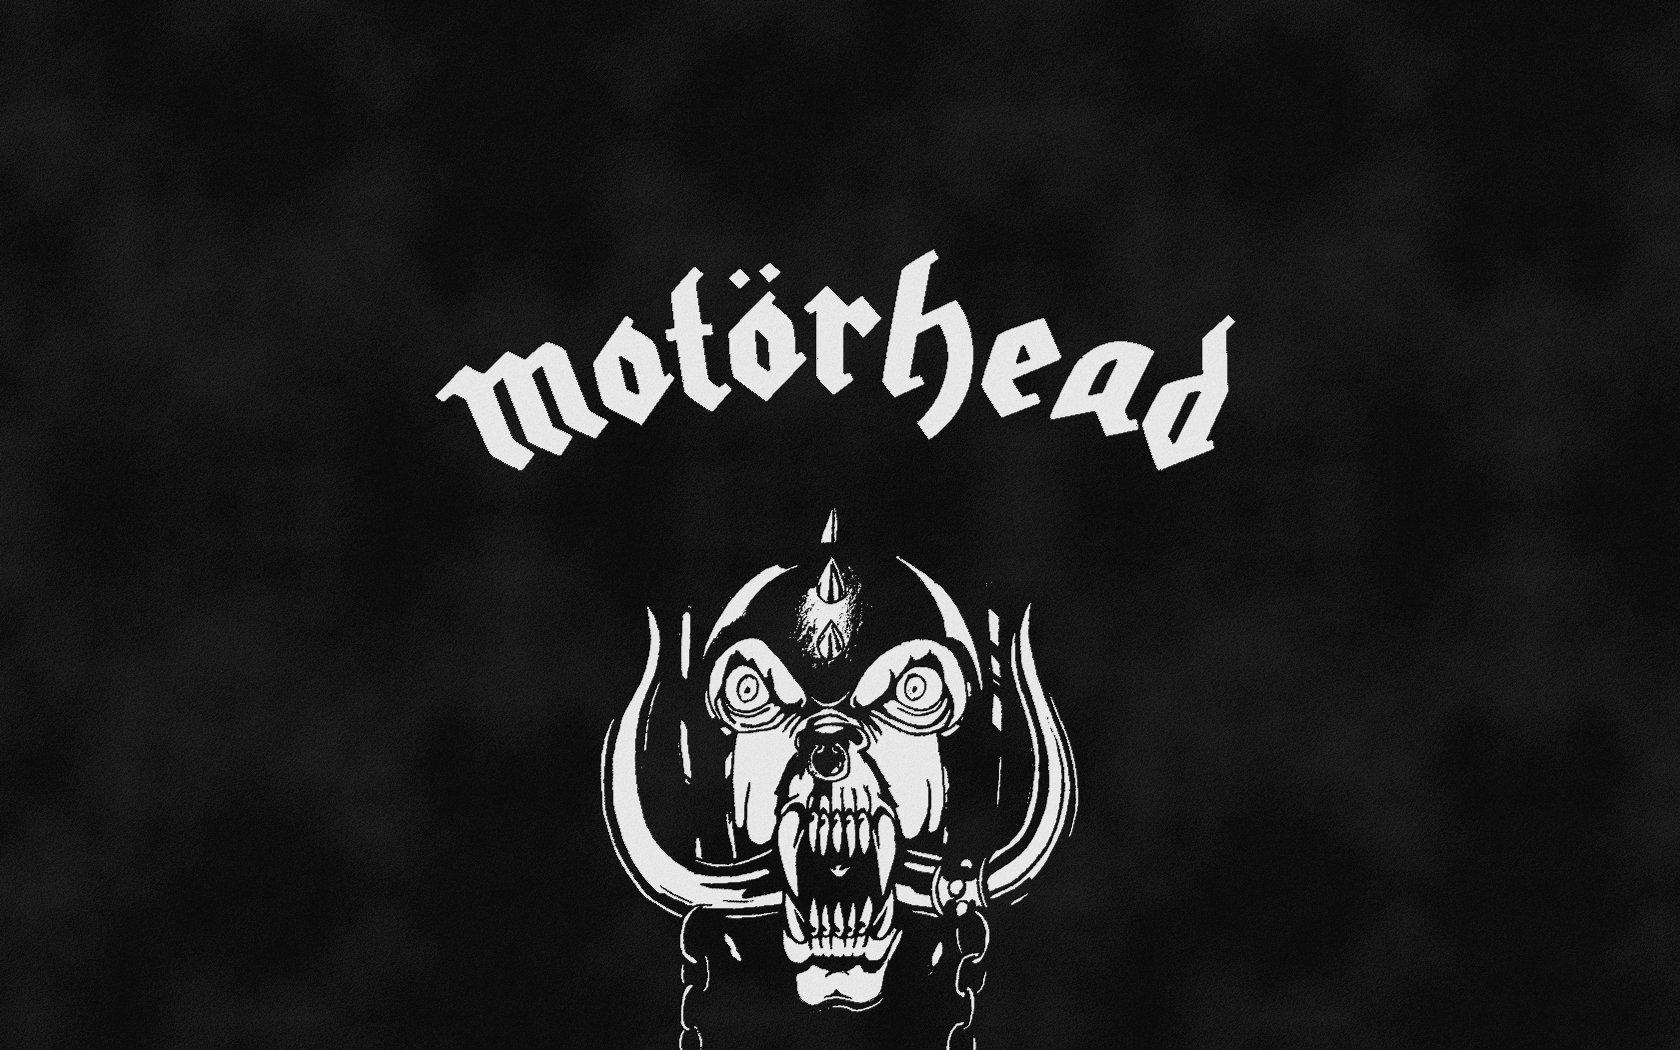 Music metal Motorhead wallpaper 1680x1050 234095 WallpaperUP 1680x1050